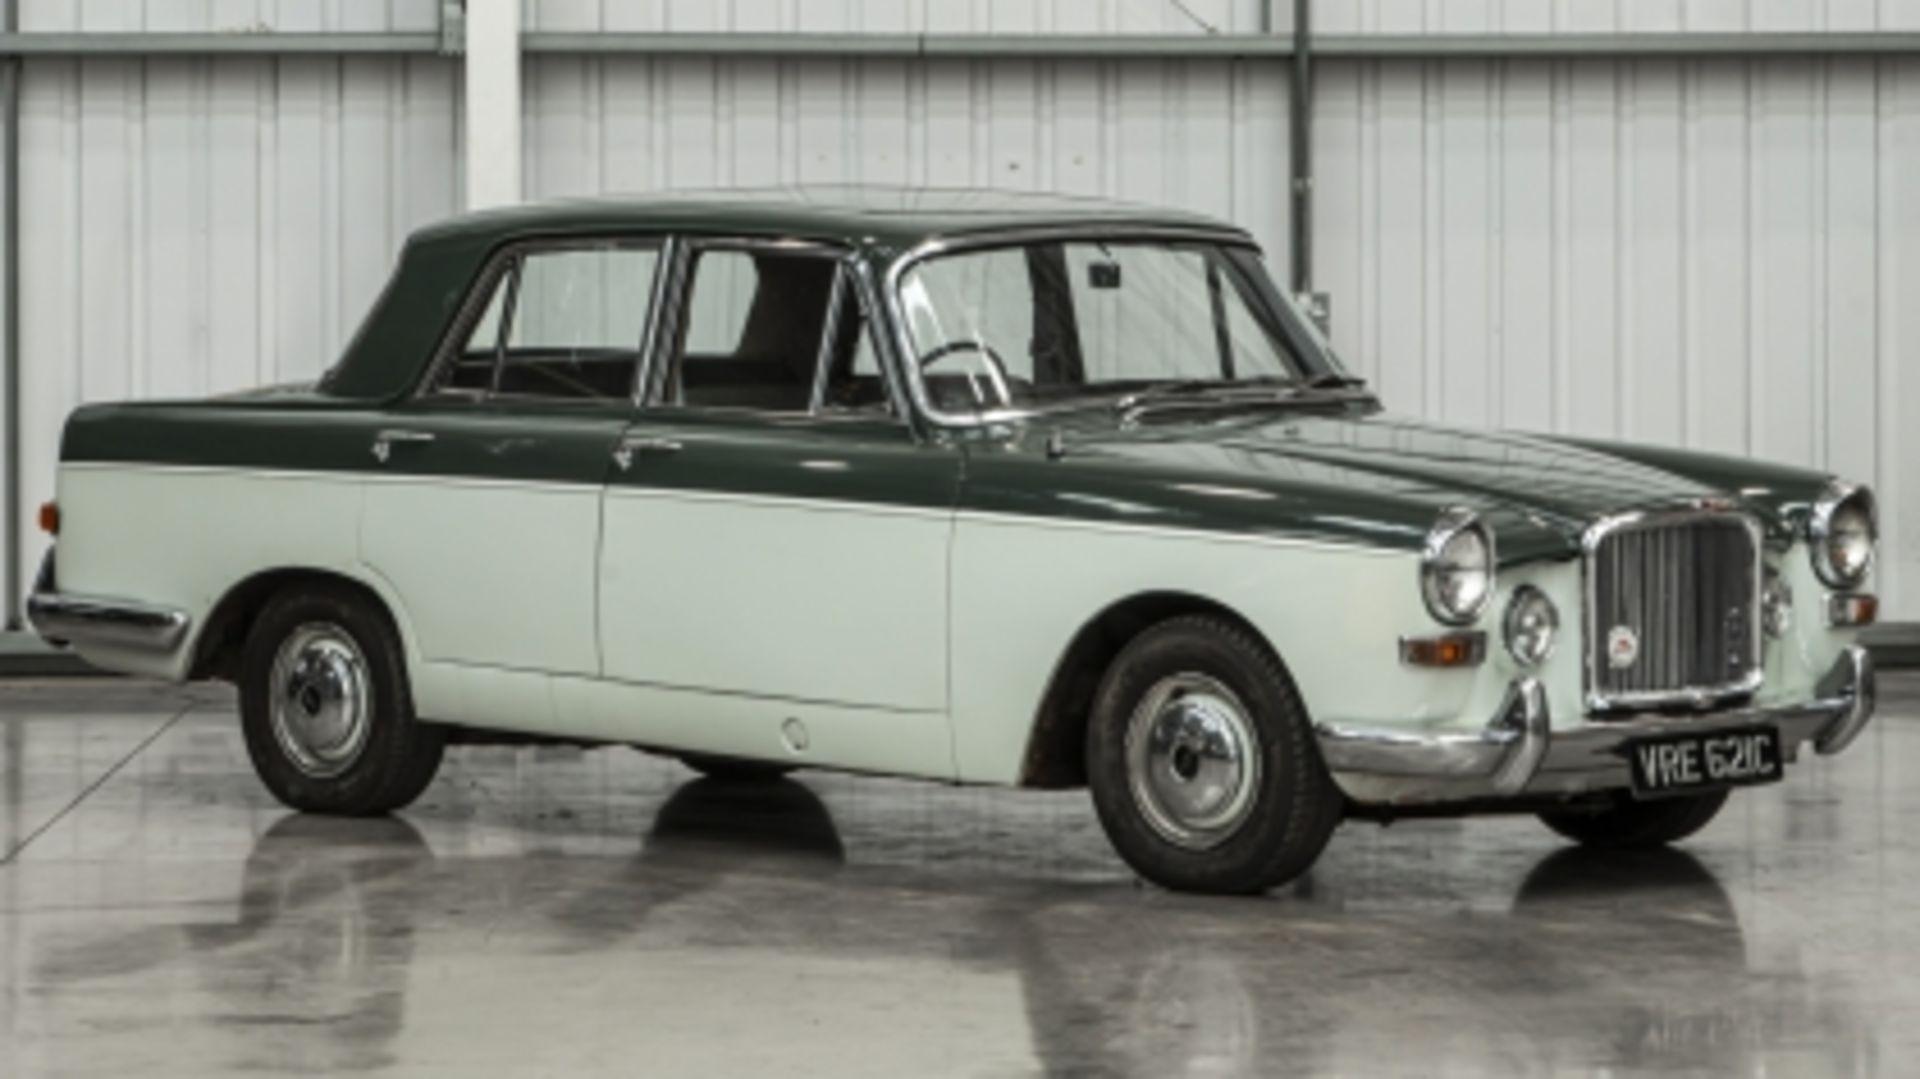 Lot 502 - 1965 Vanden Plas Princess 4-litre-R